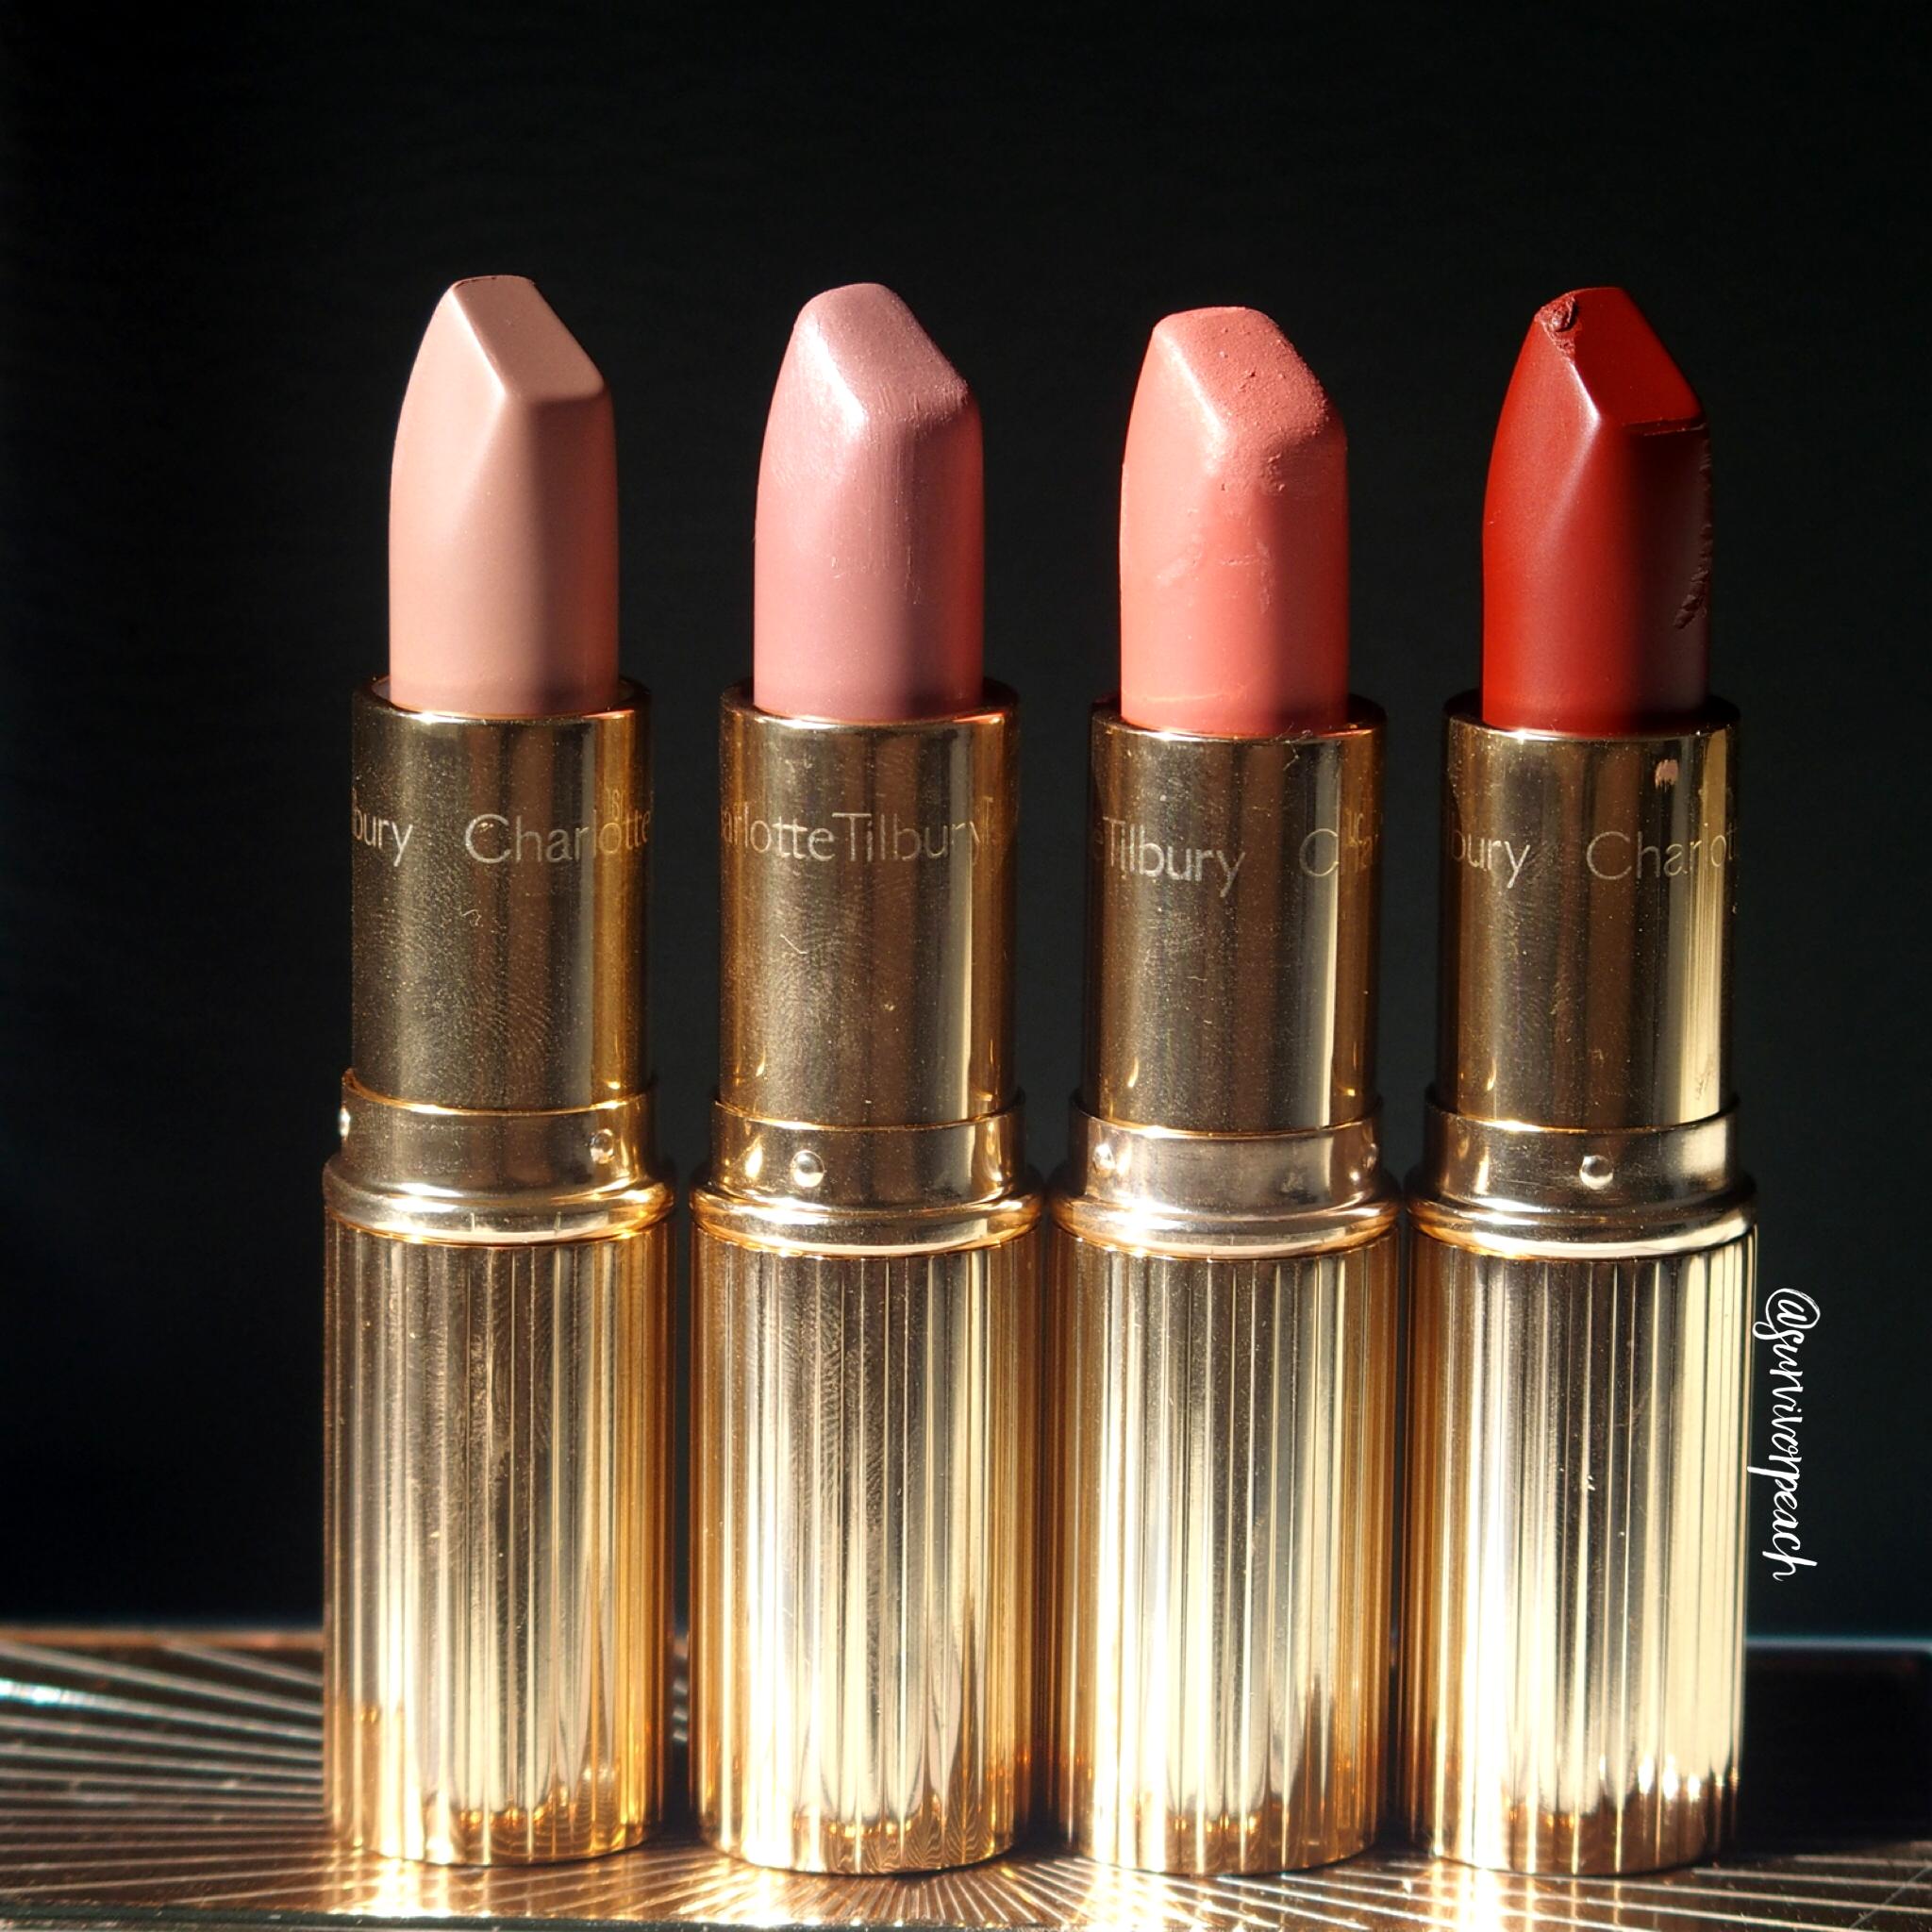 Charlotte Tilbury Matte Revolution Lipsticks in shades English Beauty, Pillow Talk, Sexy Sienna, Legendary Queen